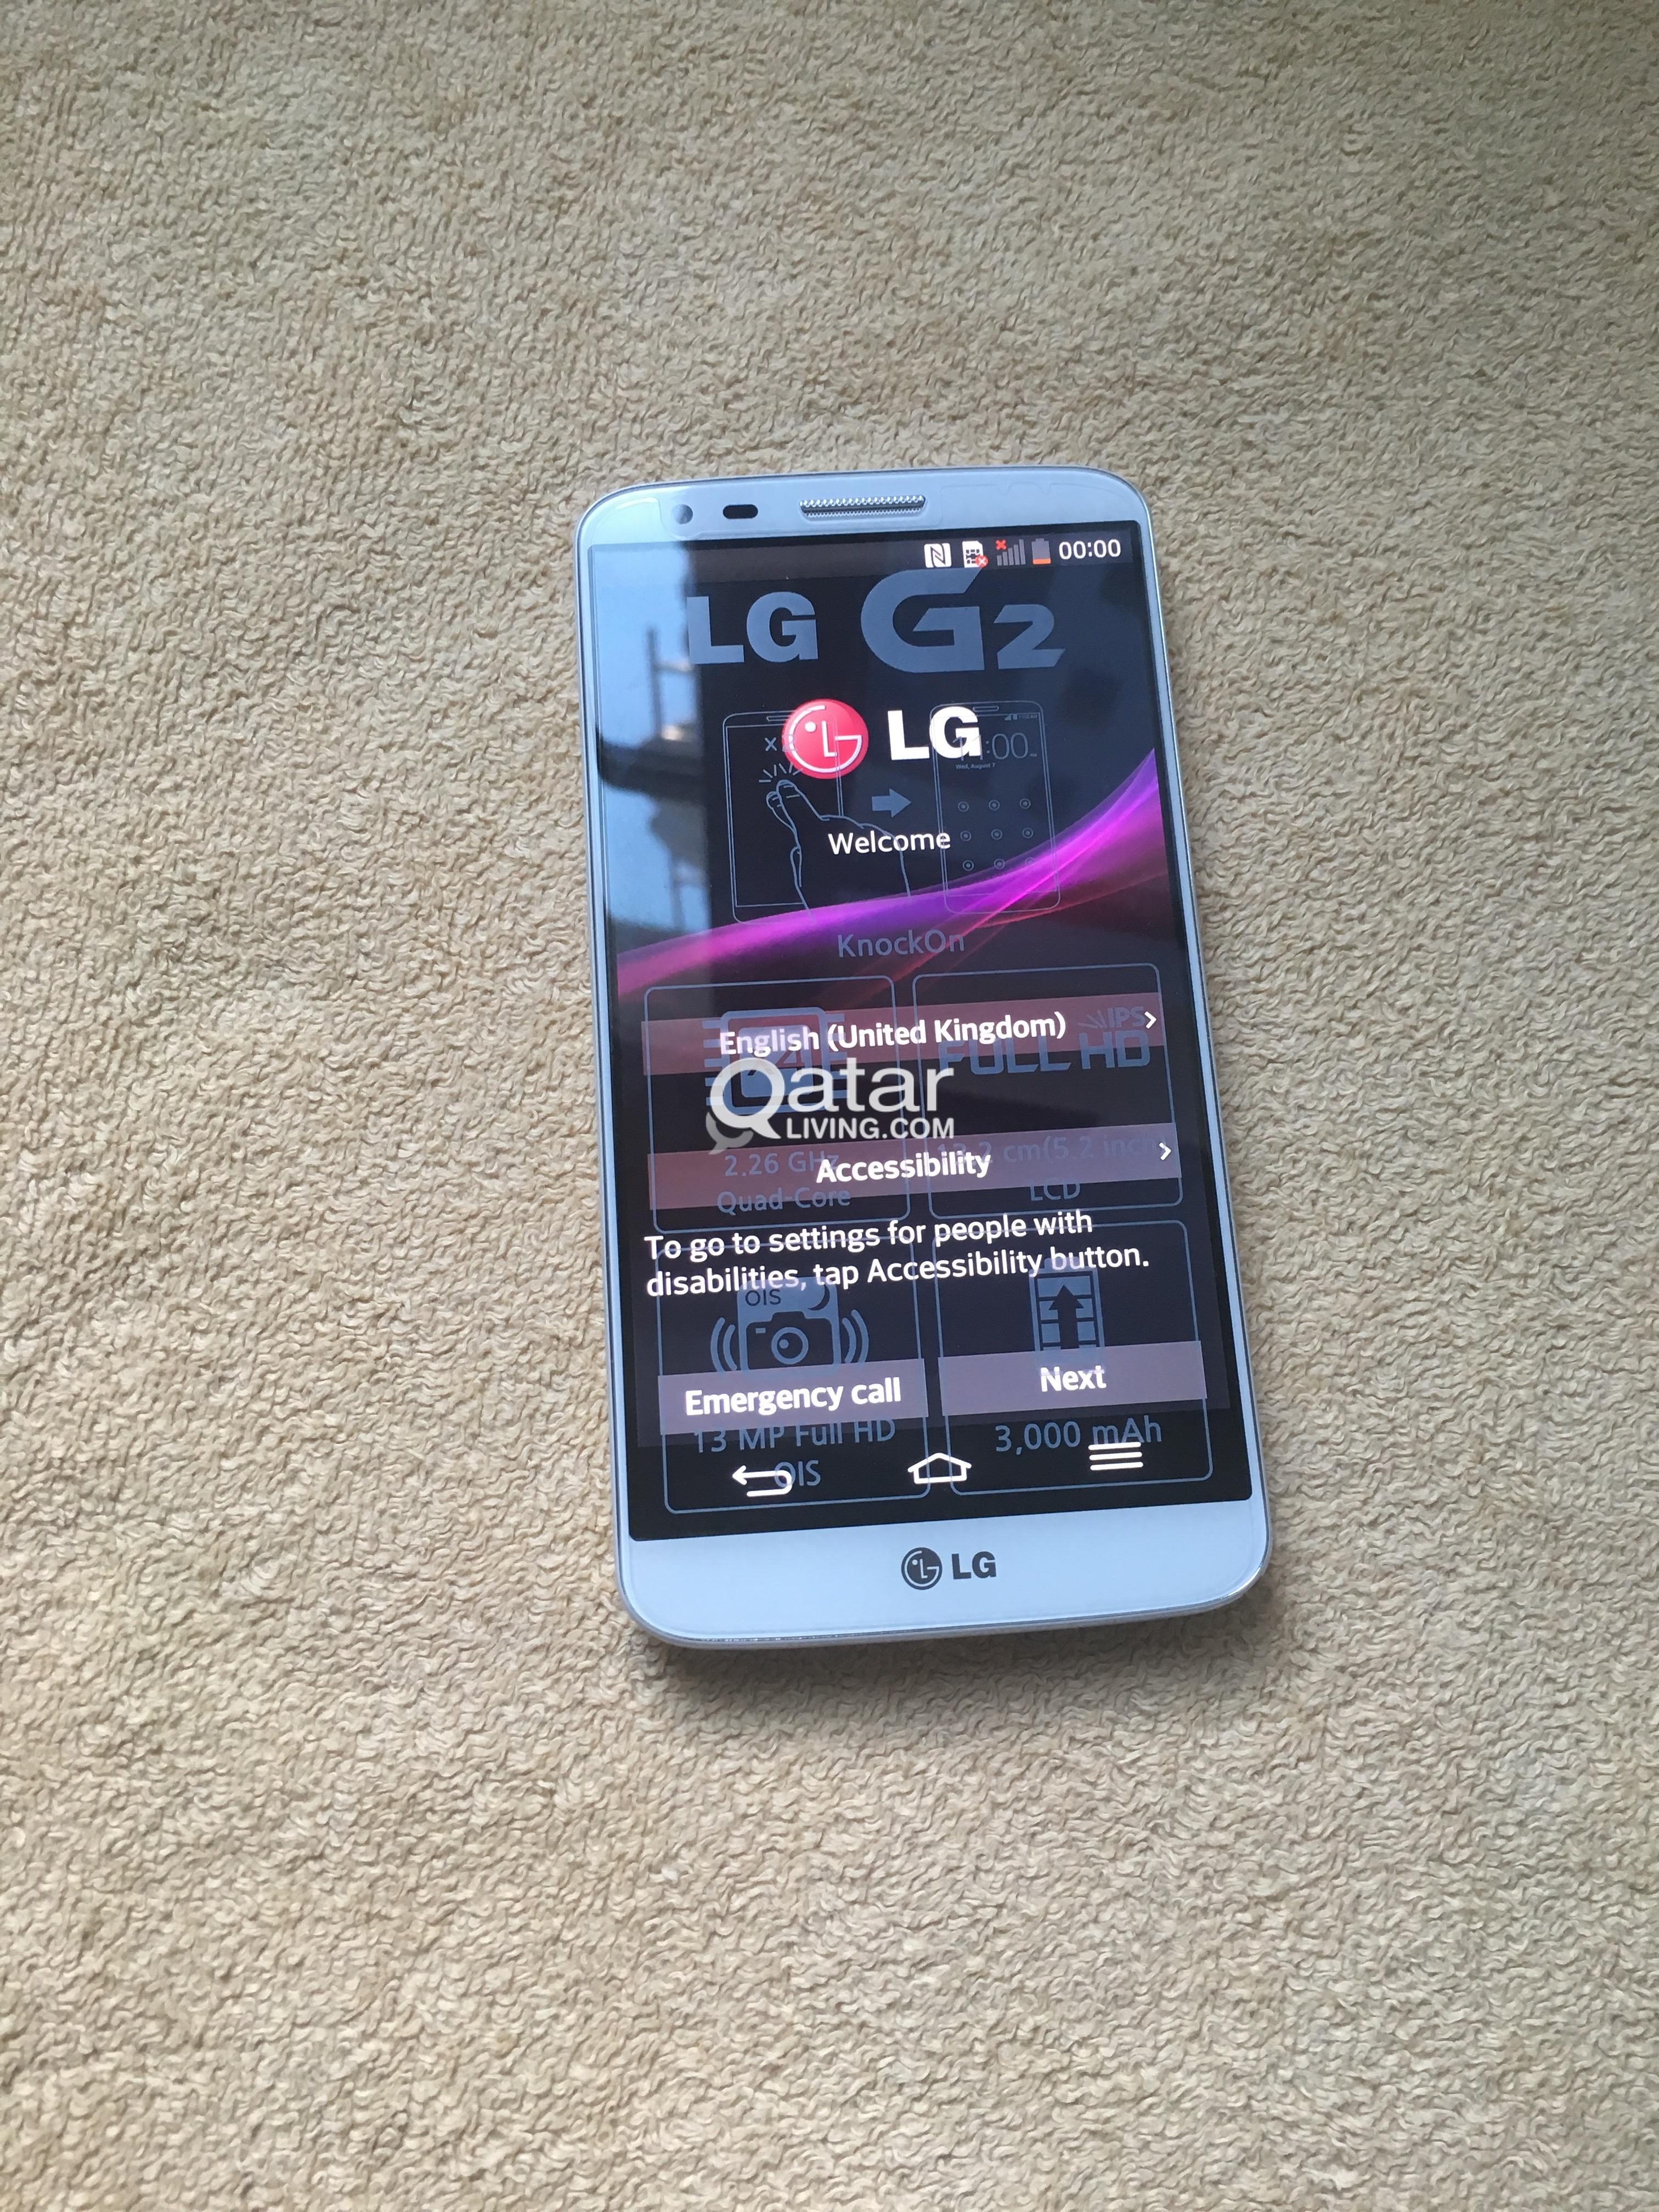 Brand New Lg G2 Amazing Price For Immediate Sale Qatar Living D802 16gb White